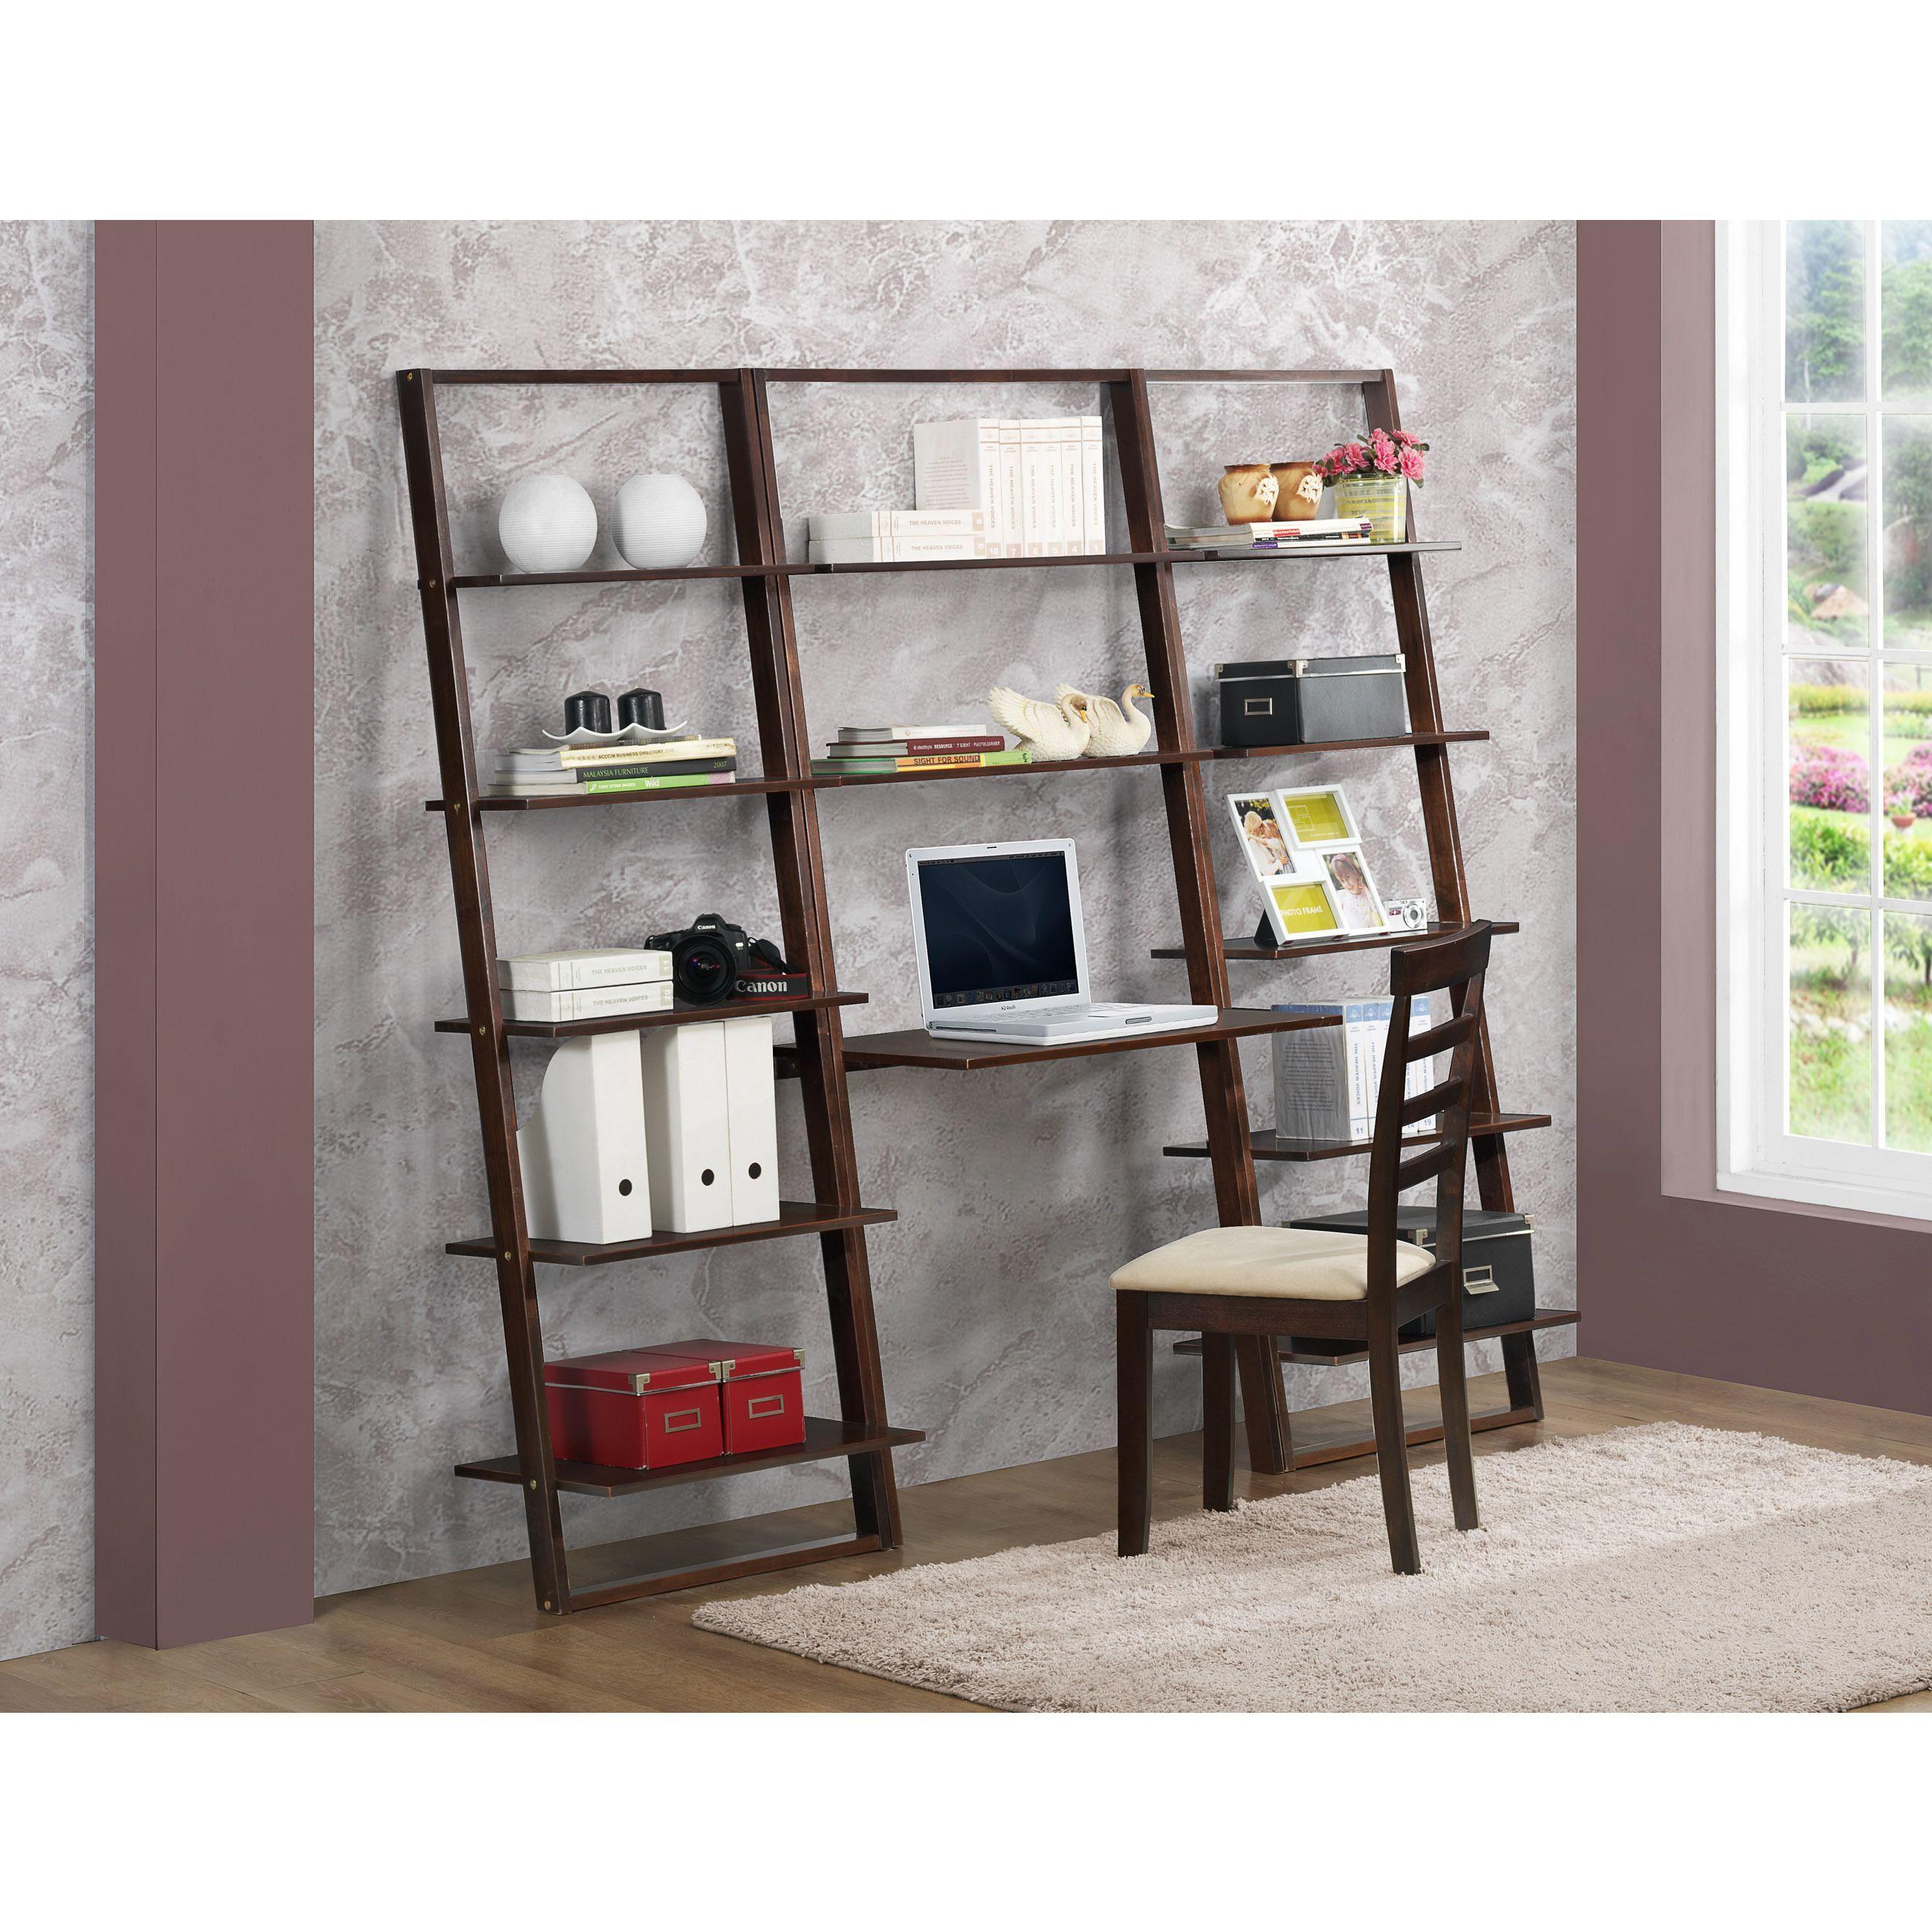 Arlington cappucino wood desk with ladder bookcases arlington